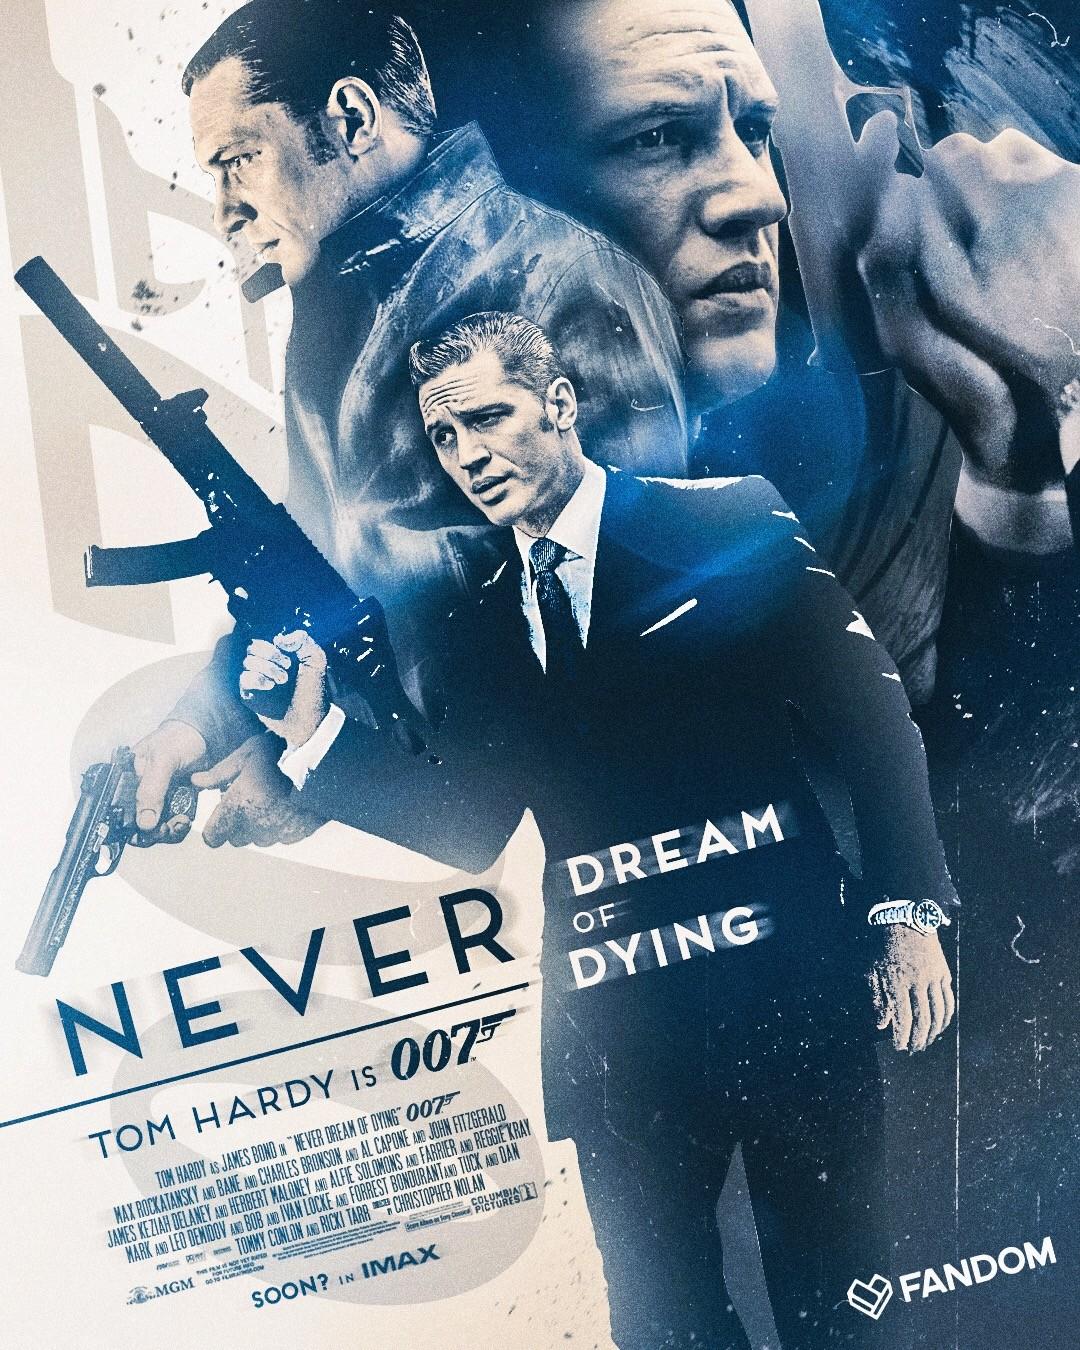 Tom Hardy is 007